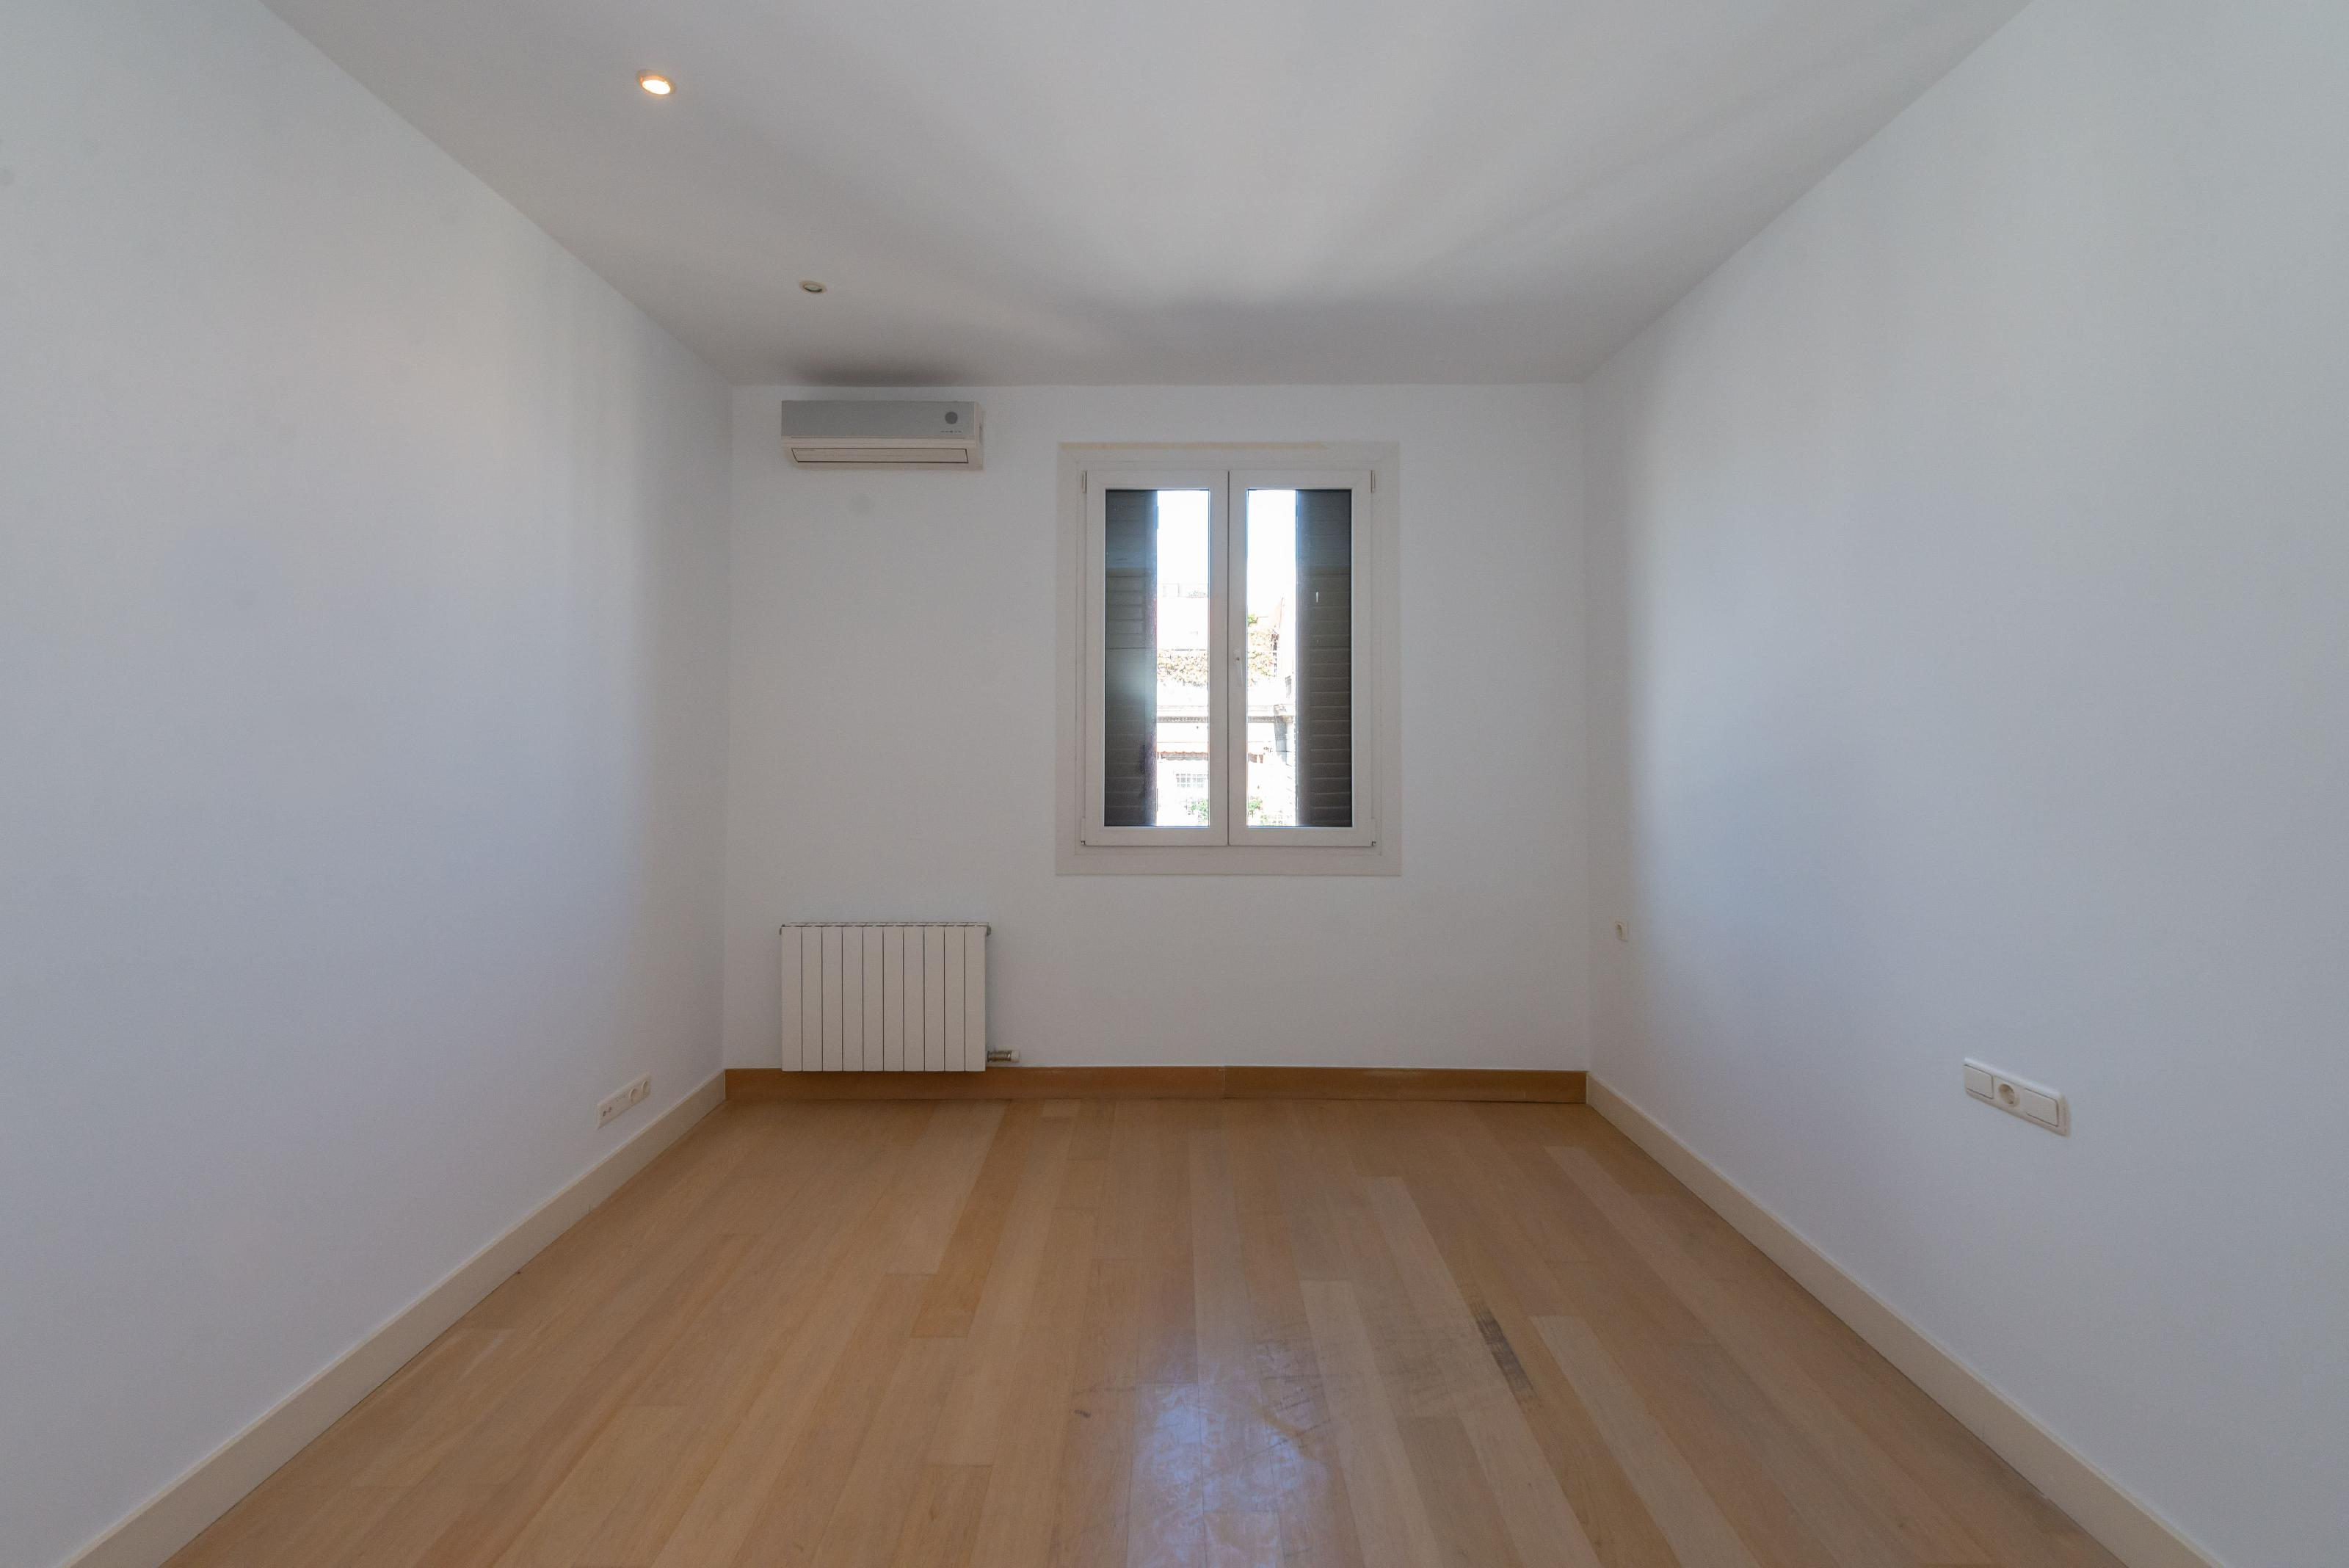 253647 Ático en venda en Sarrià-Sant Gervasi, Sant Gervasi-Galvany 27